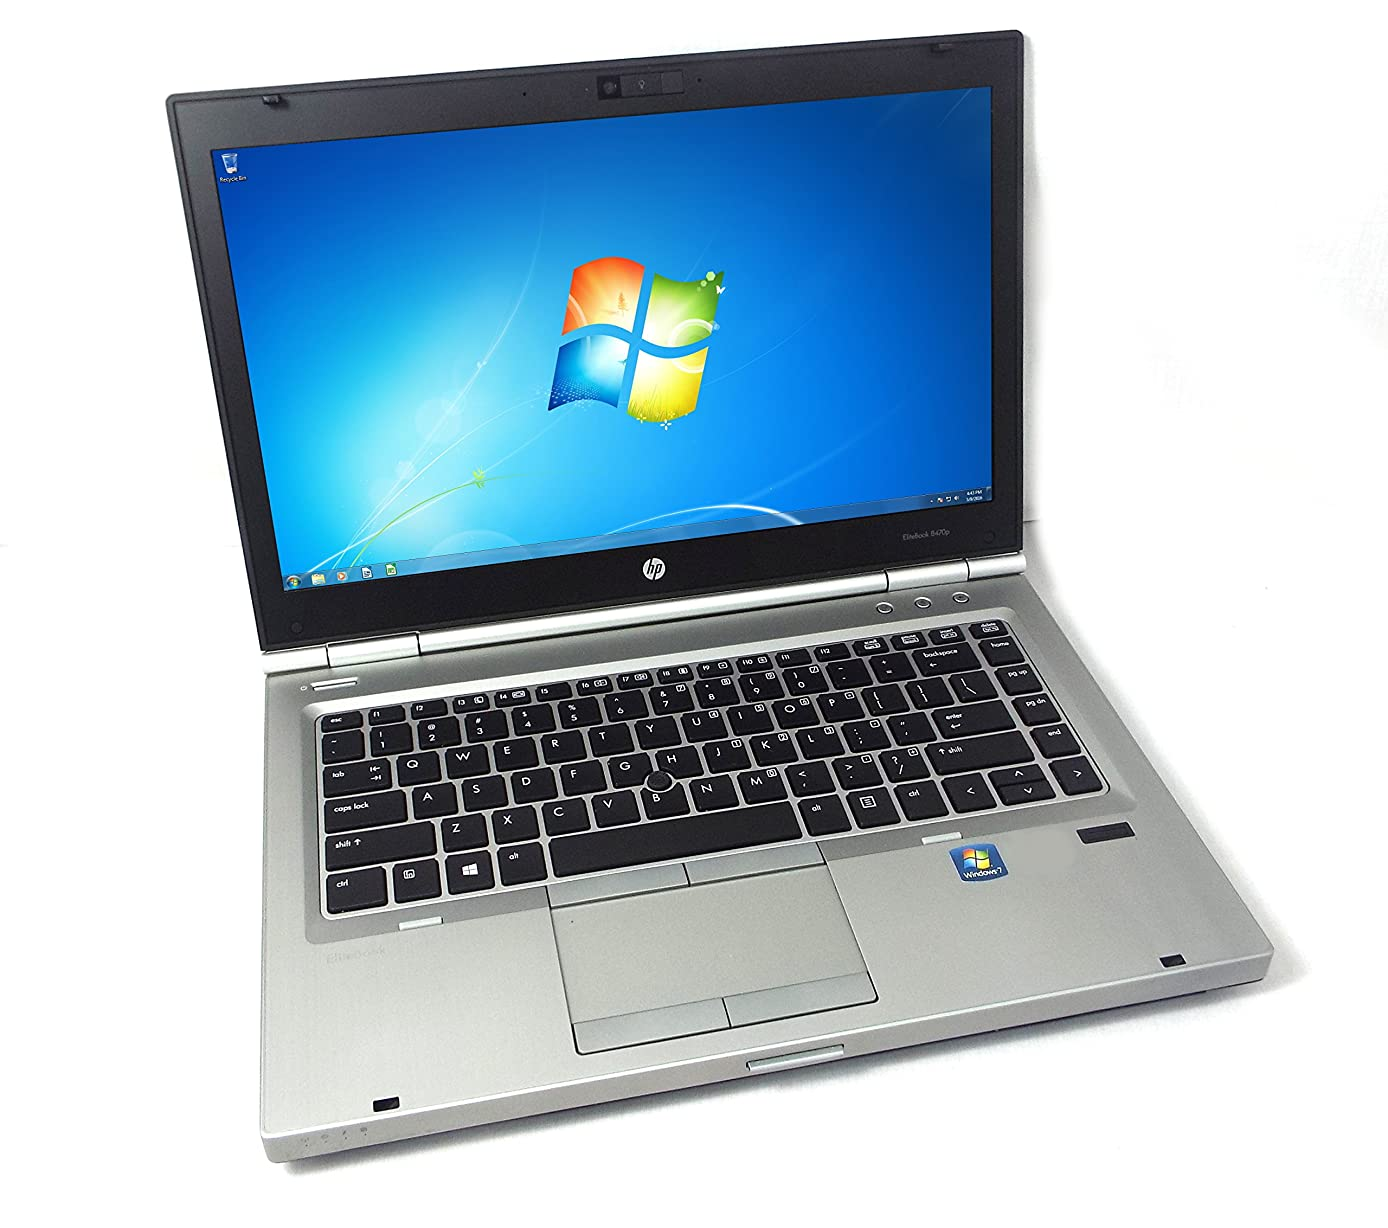 "HP EliteBook 8470p 14"" Laptop PC, Intel Core i5-3320M 2.6GHz, 4GB DDR3 RAM, 500GB HDD, Win-7 Pro"